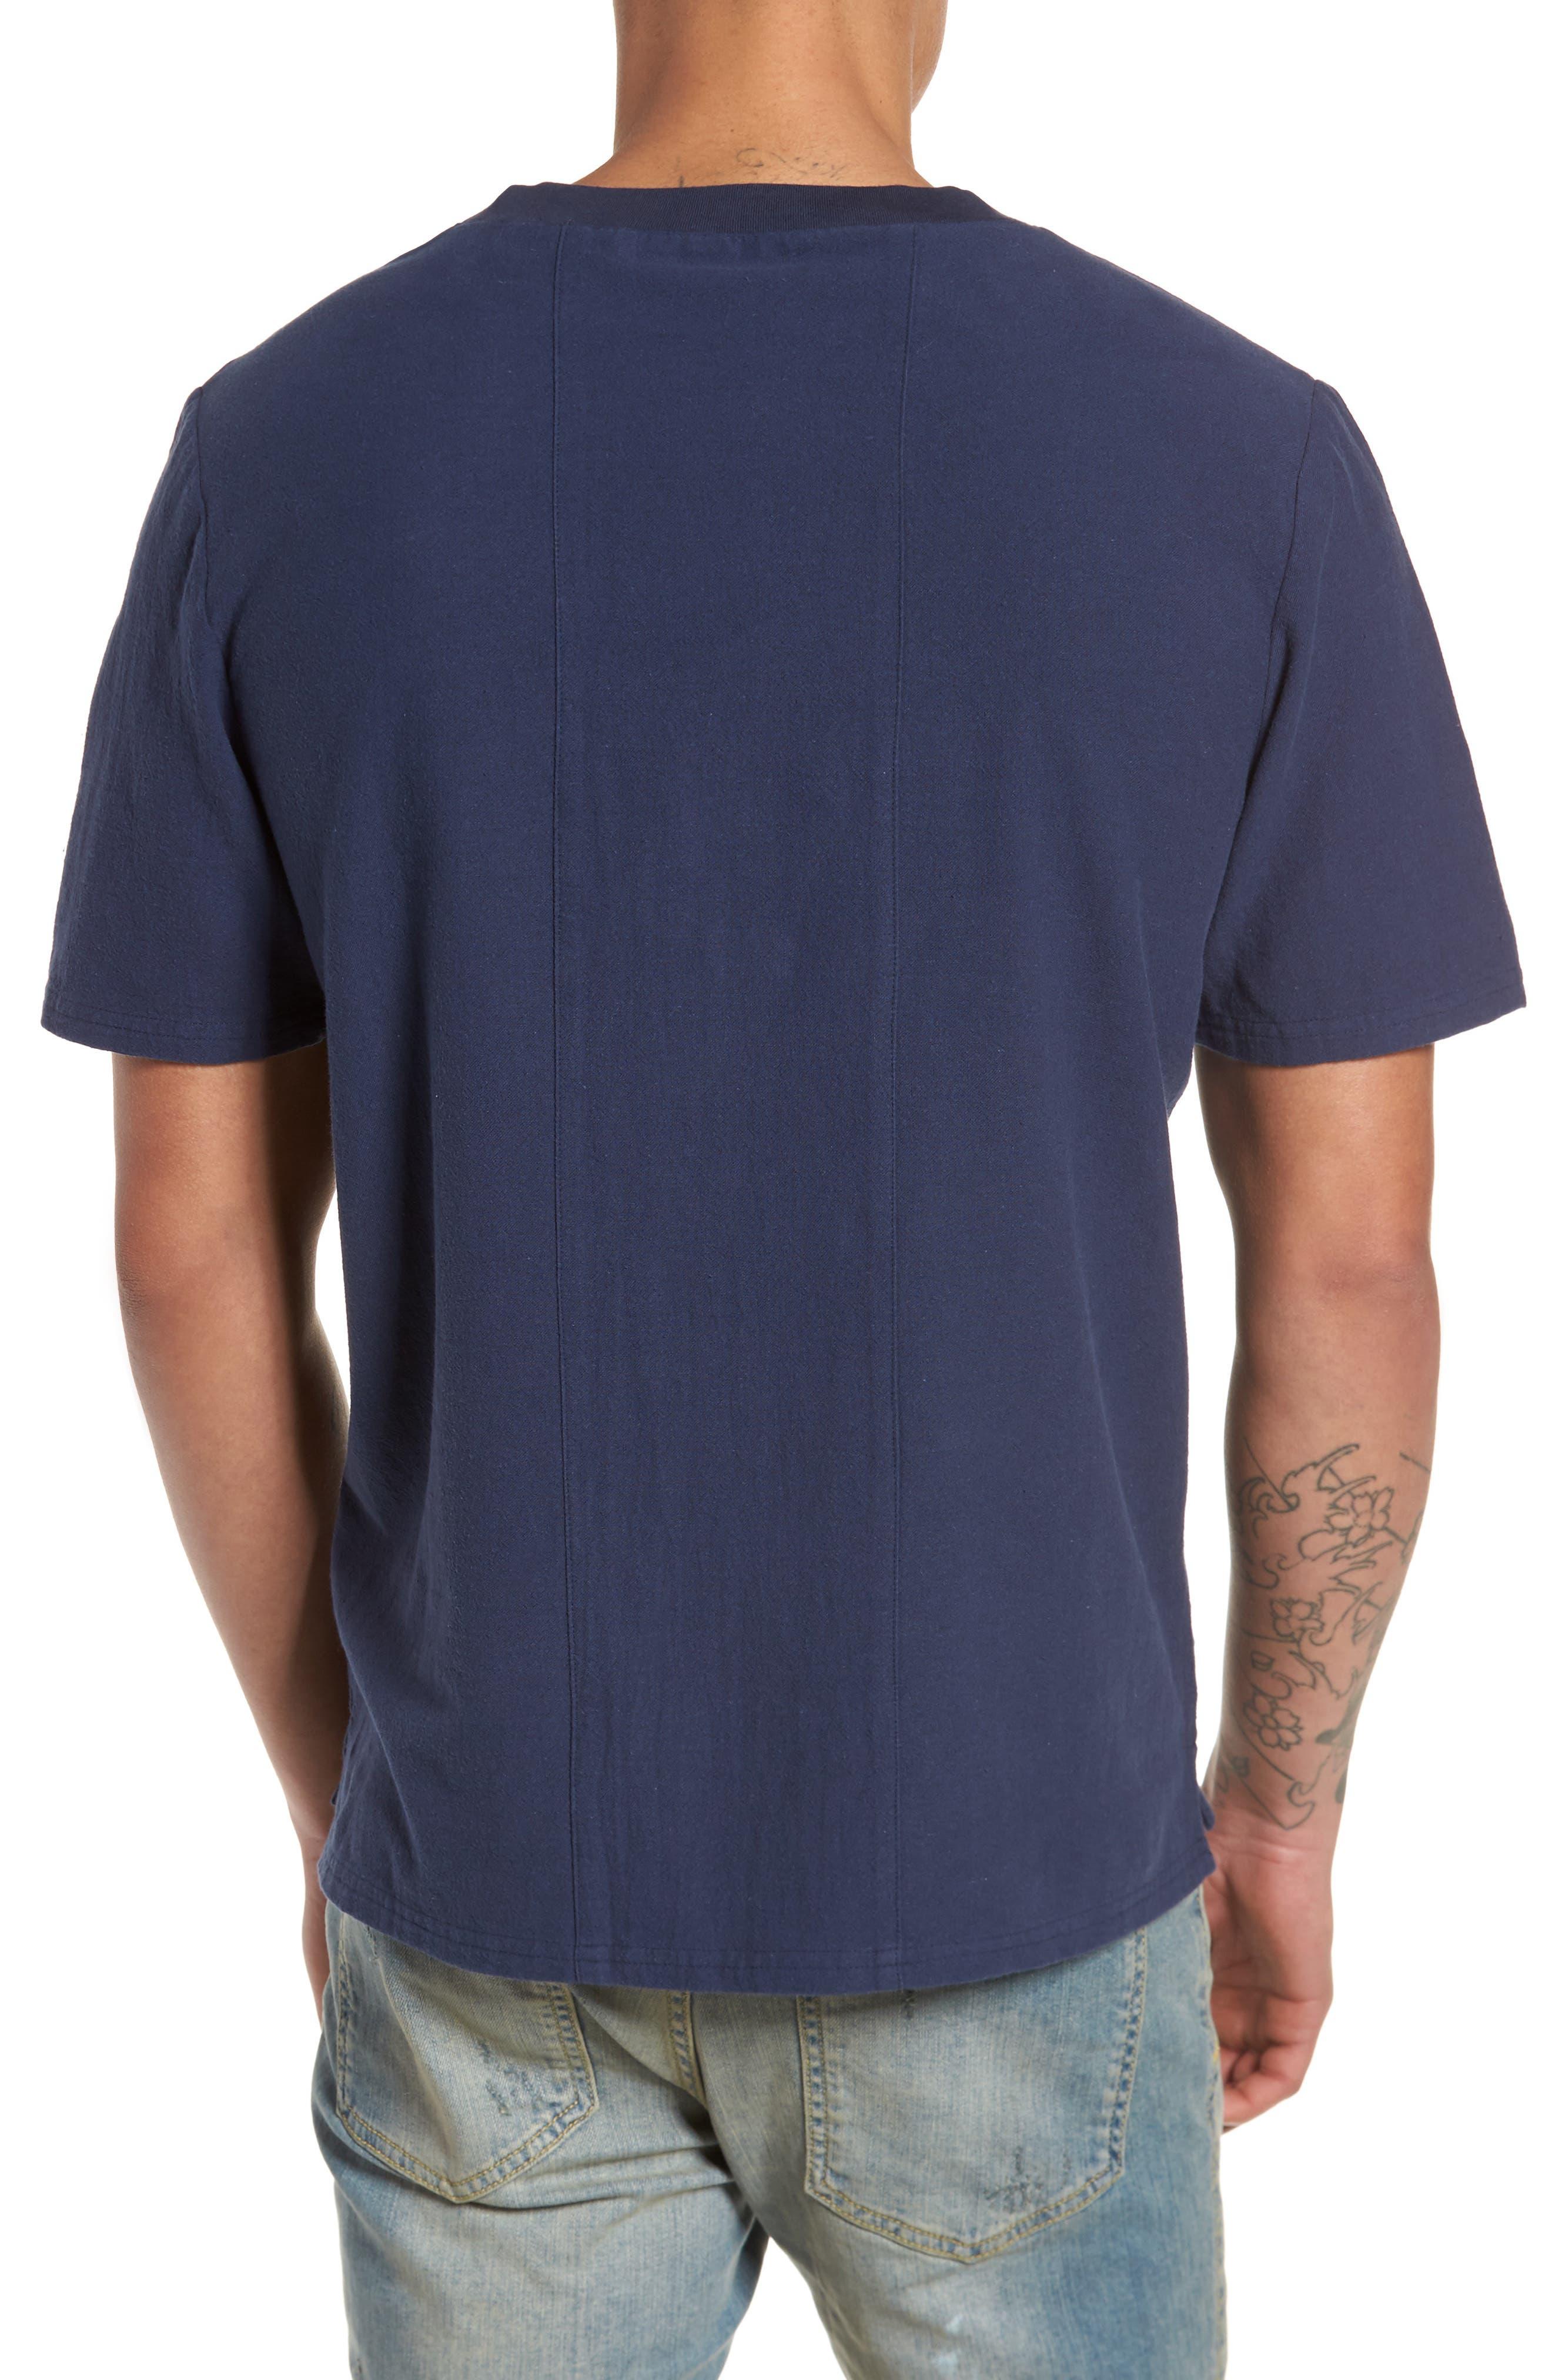 Broads Woven T-Shirt,                             Alternate thumbnail 2, color,                             400